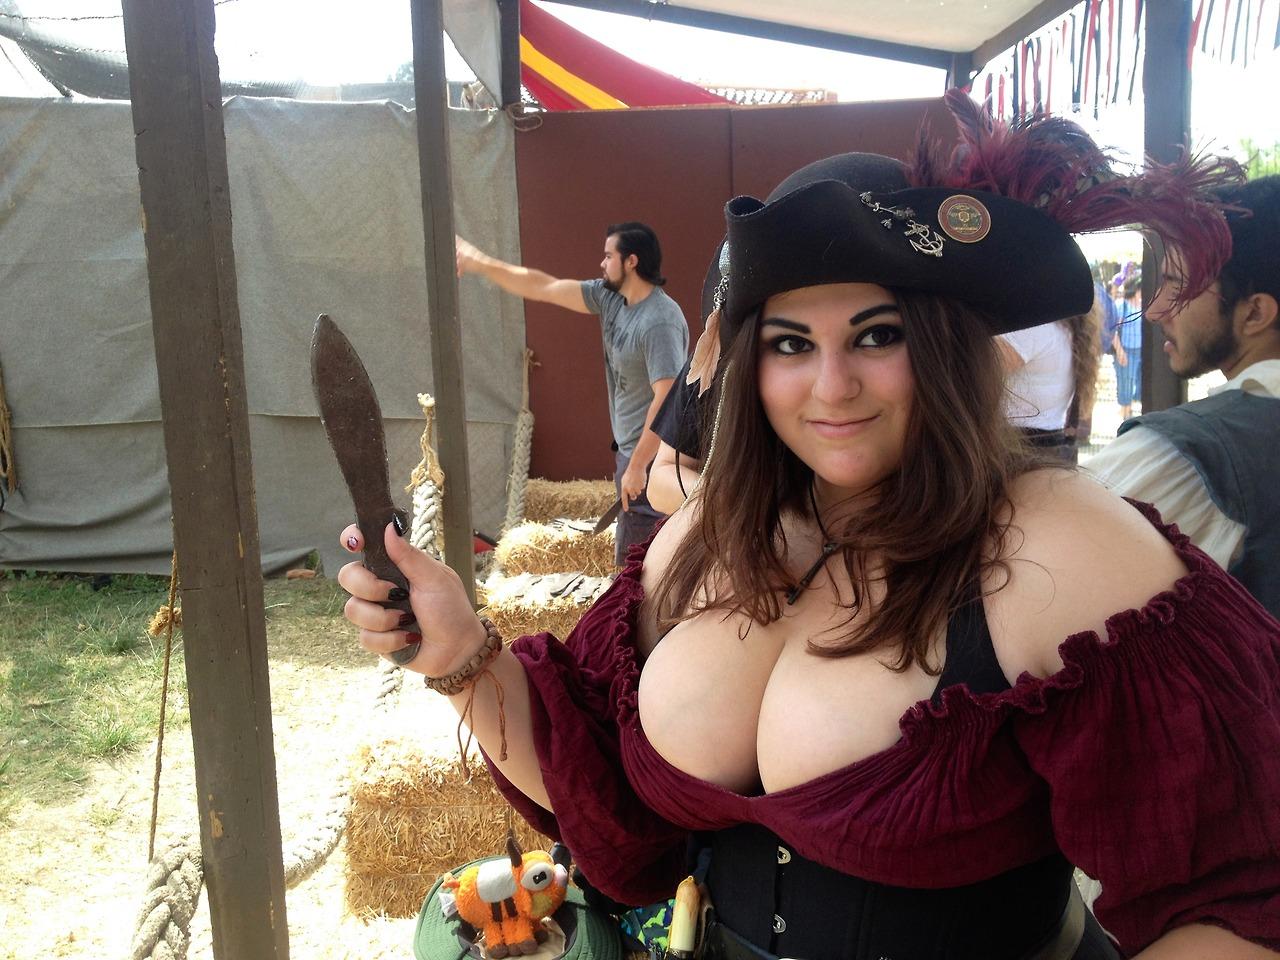 renaissance-fair-nipples